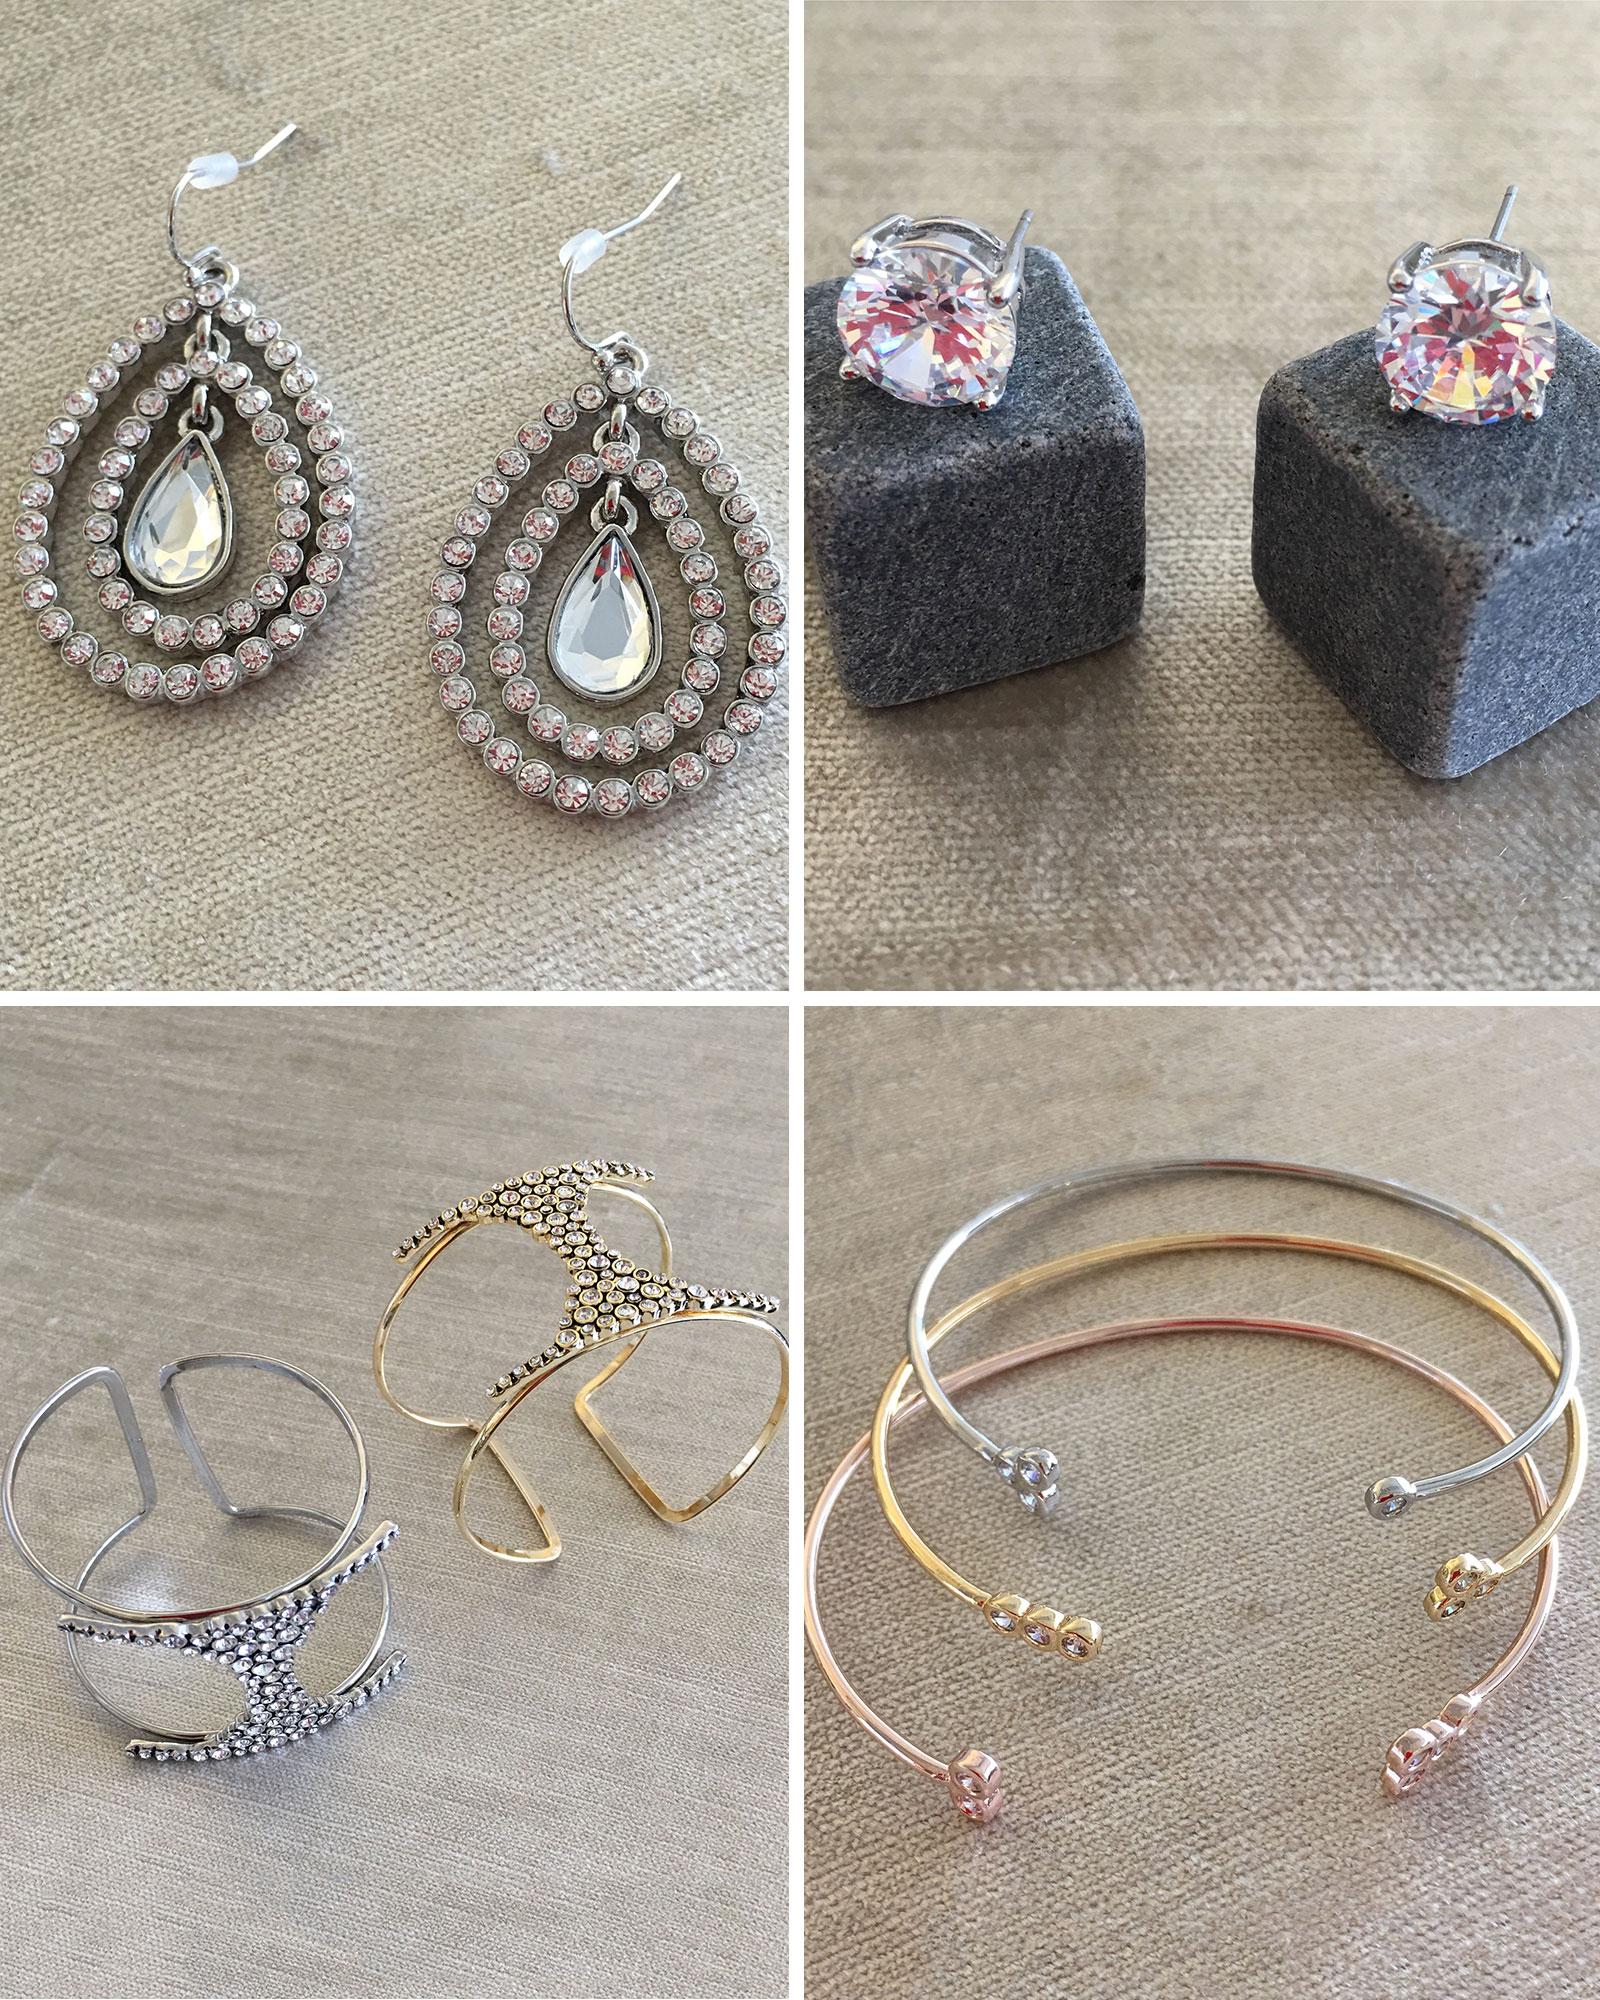 jessica-simpson-jewelry-0316-split.jpg